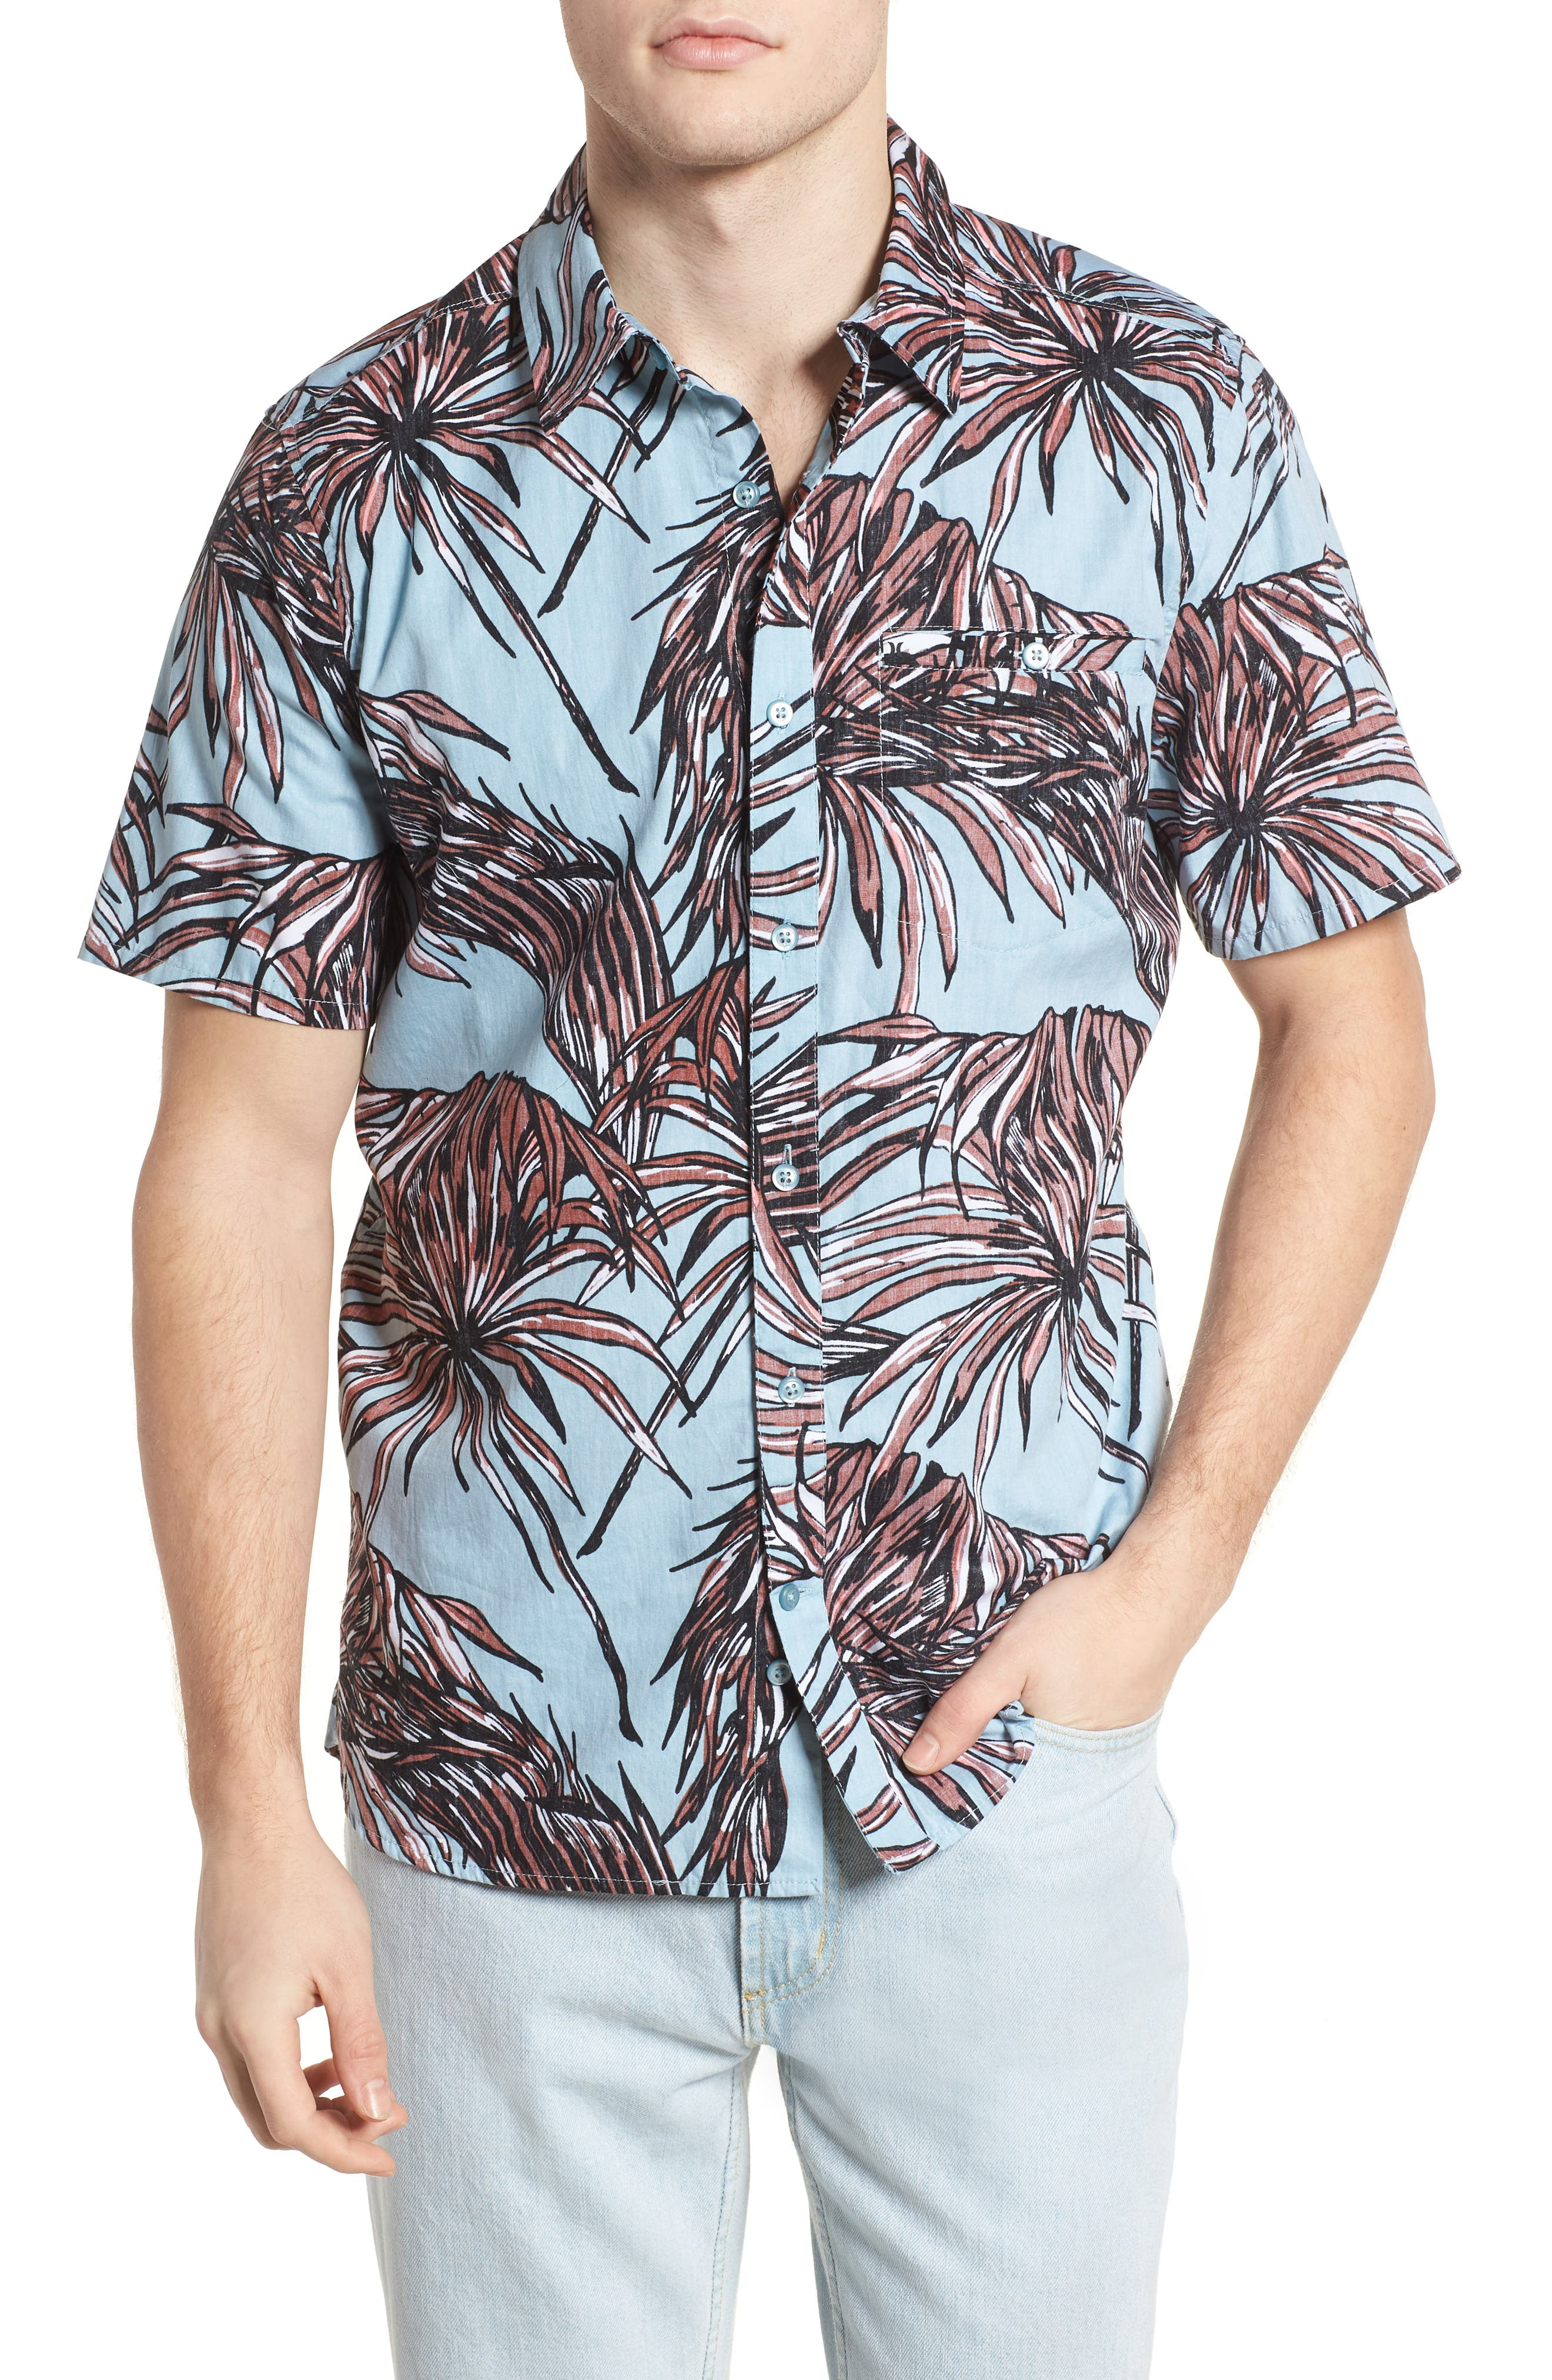 Koko Shirt,                         Main,                         color, Ocean Bliss